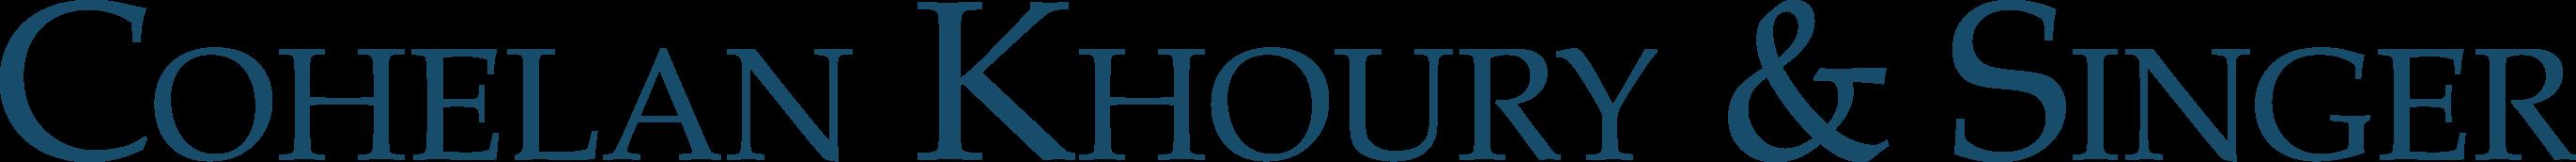 Cohelan Khoury & Singer Logo